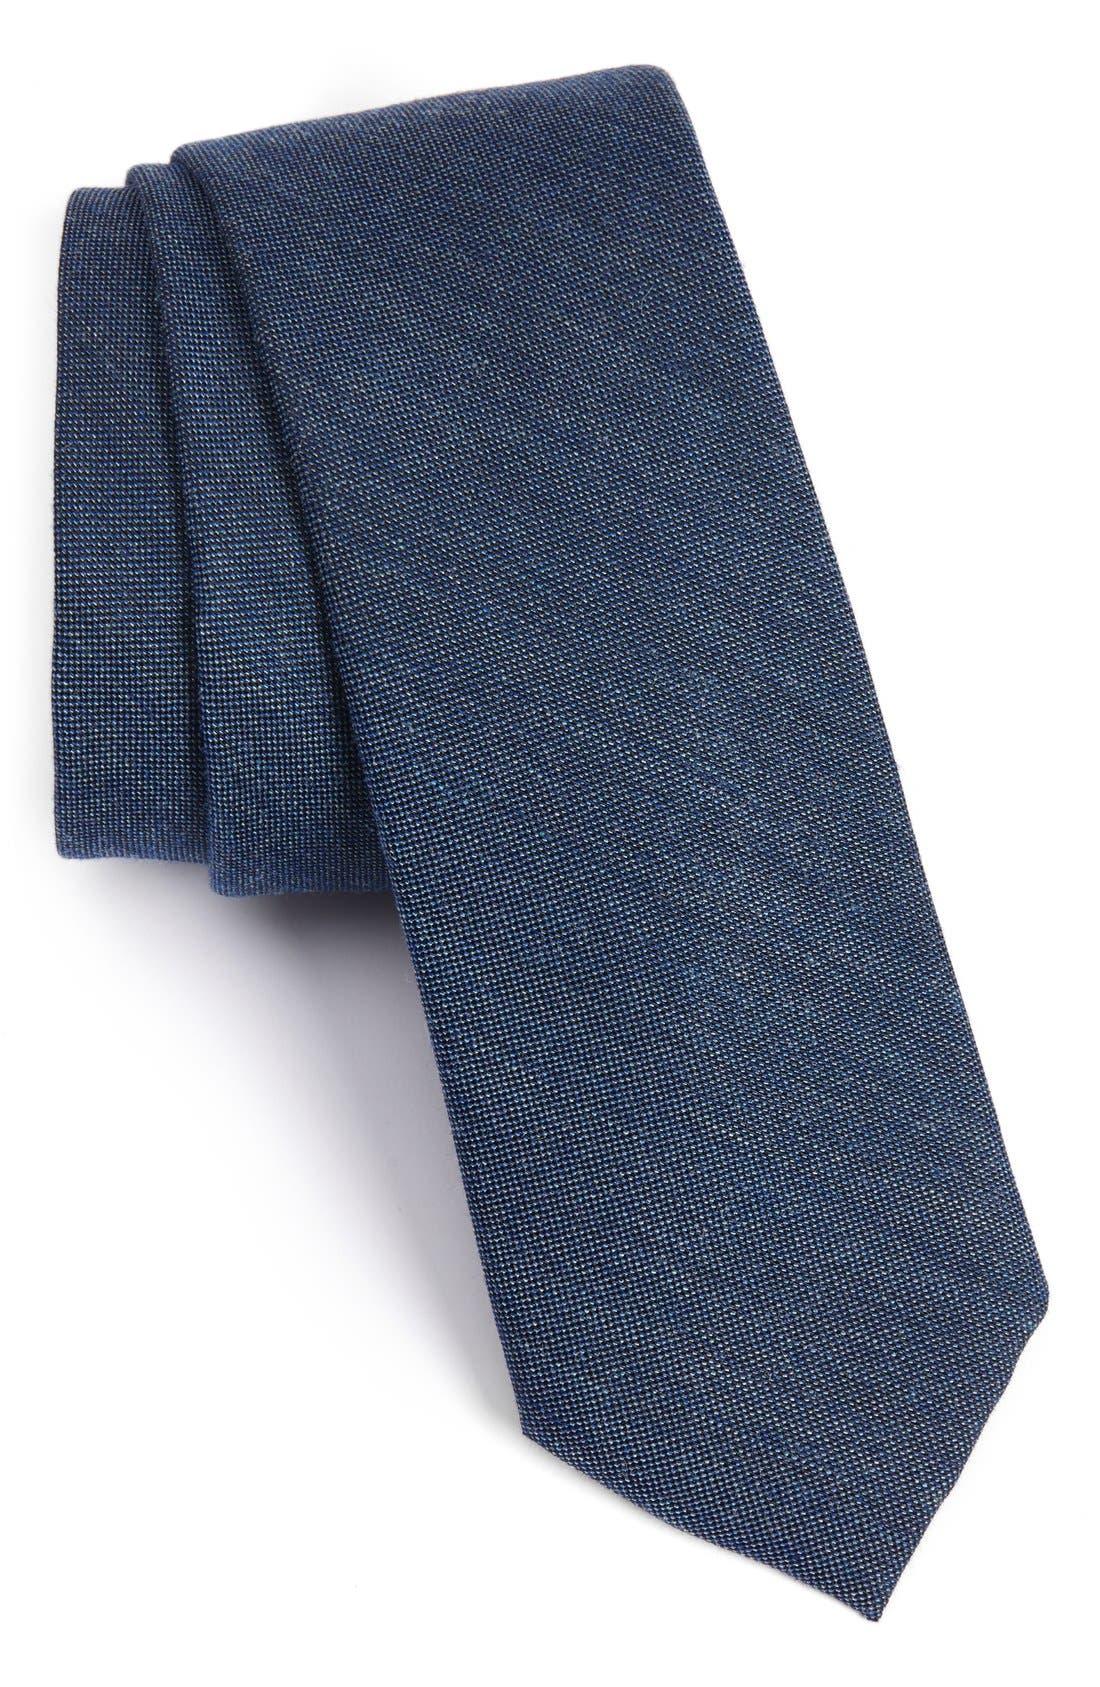 Main Image - Calibrate Mélange Woven Skinny Tie